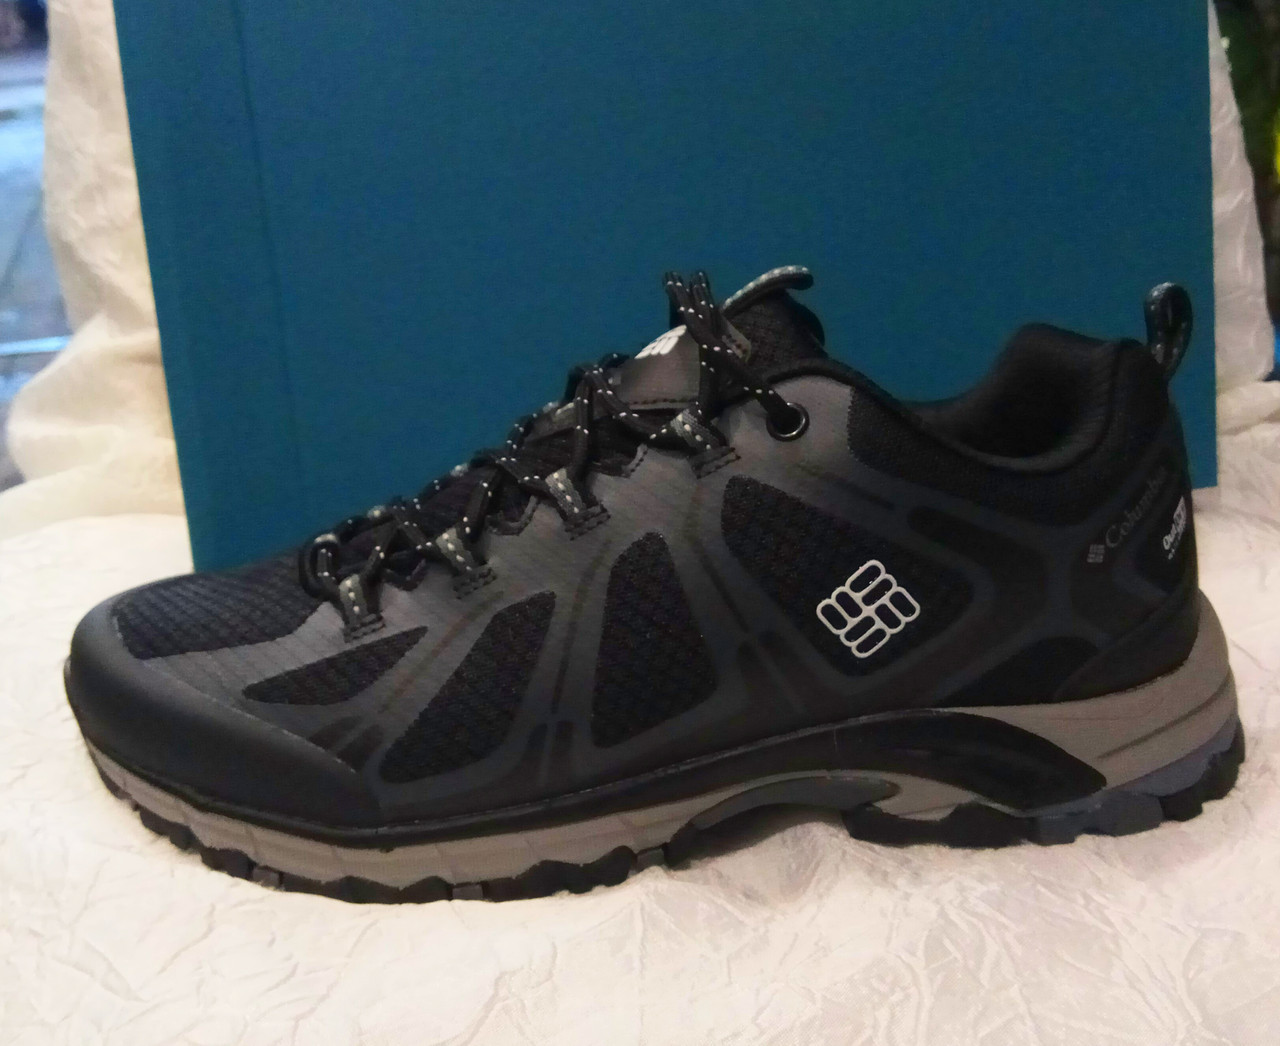 da838ec2 Мужские кроссовки Columbia Peakfreak Xcrsn (Waterproof) черные ...